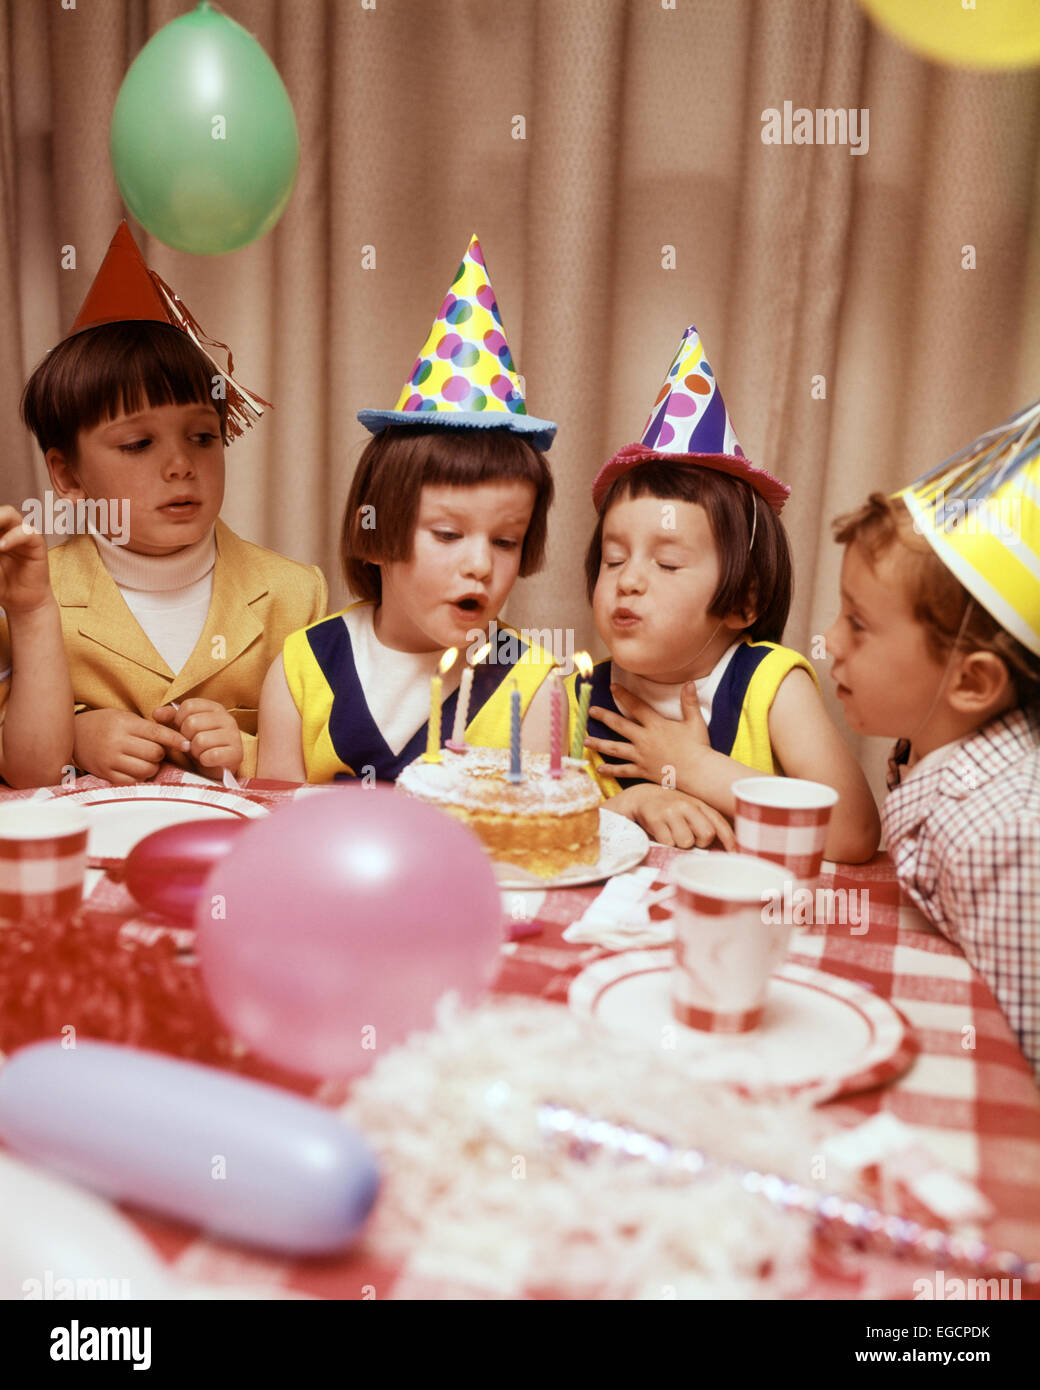 Birthday Cakes Twins Boy Girl Stock Photos Amp Birthday